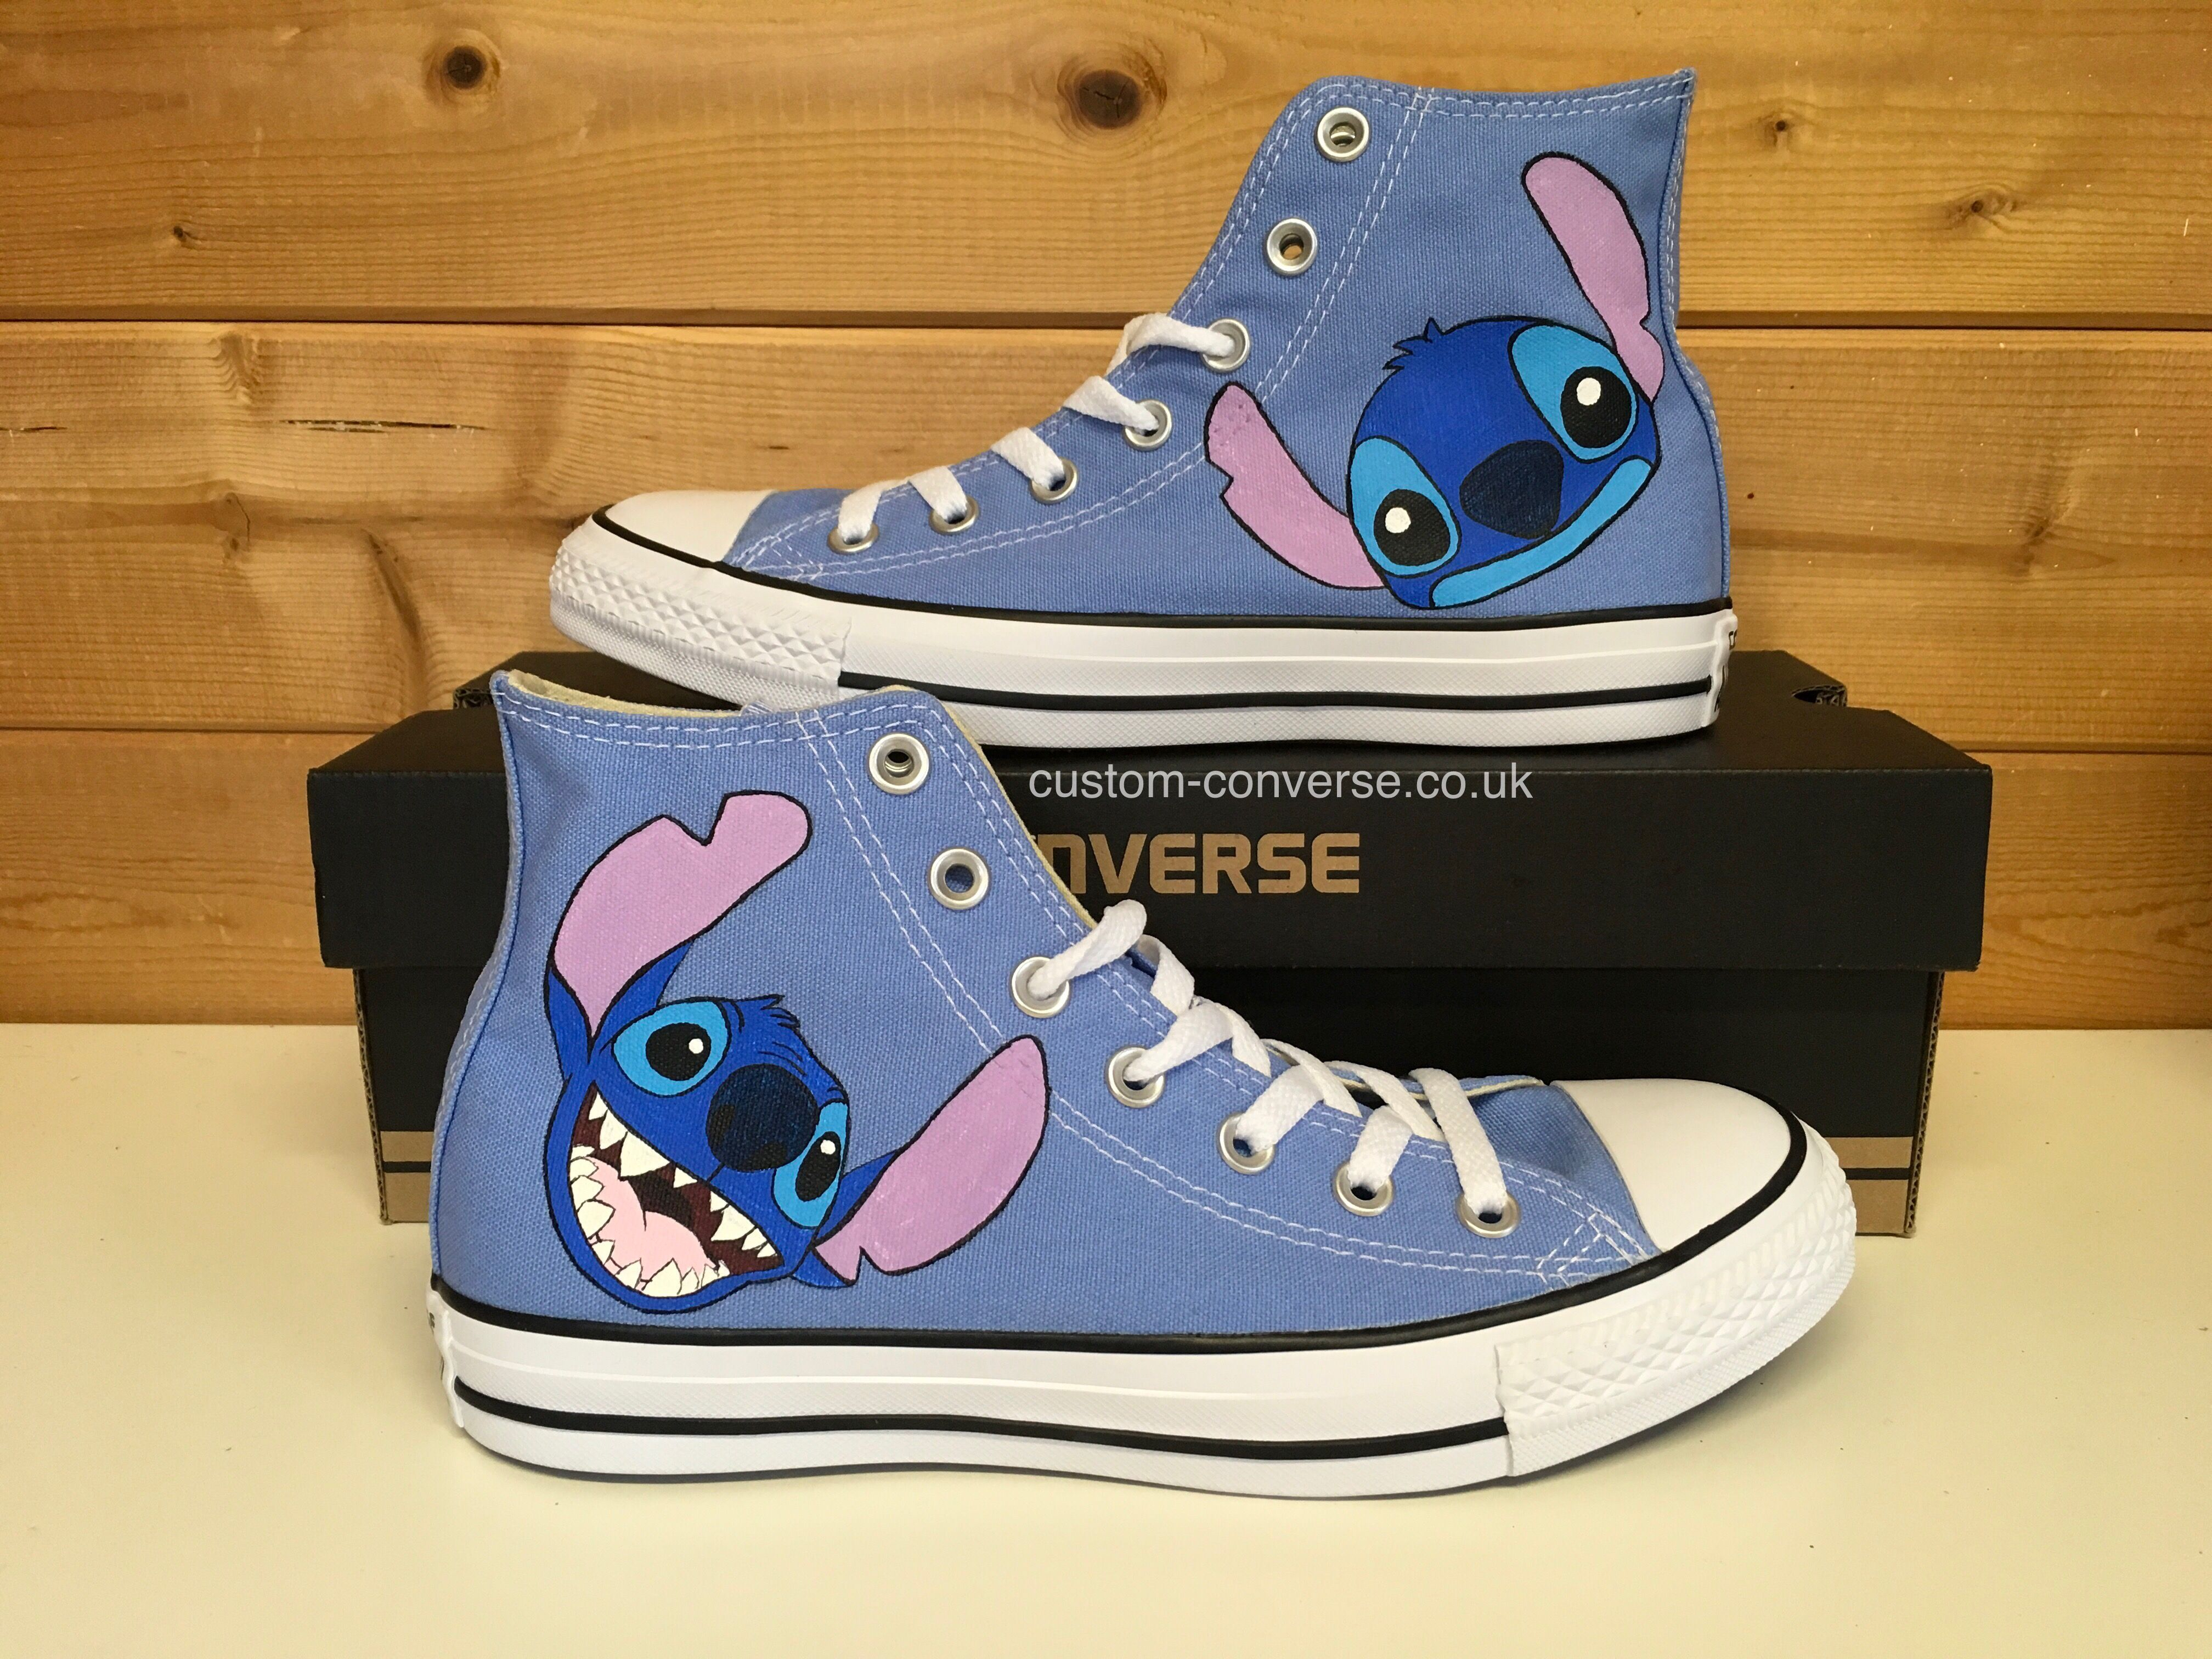 3a9285d11d17 Stitch High Top Converse Design Your Own Converse